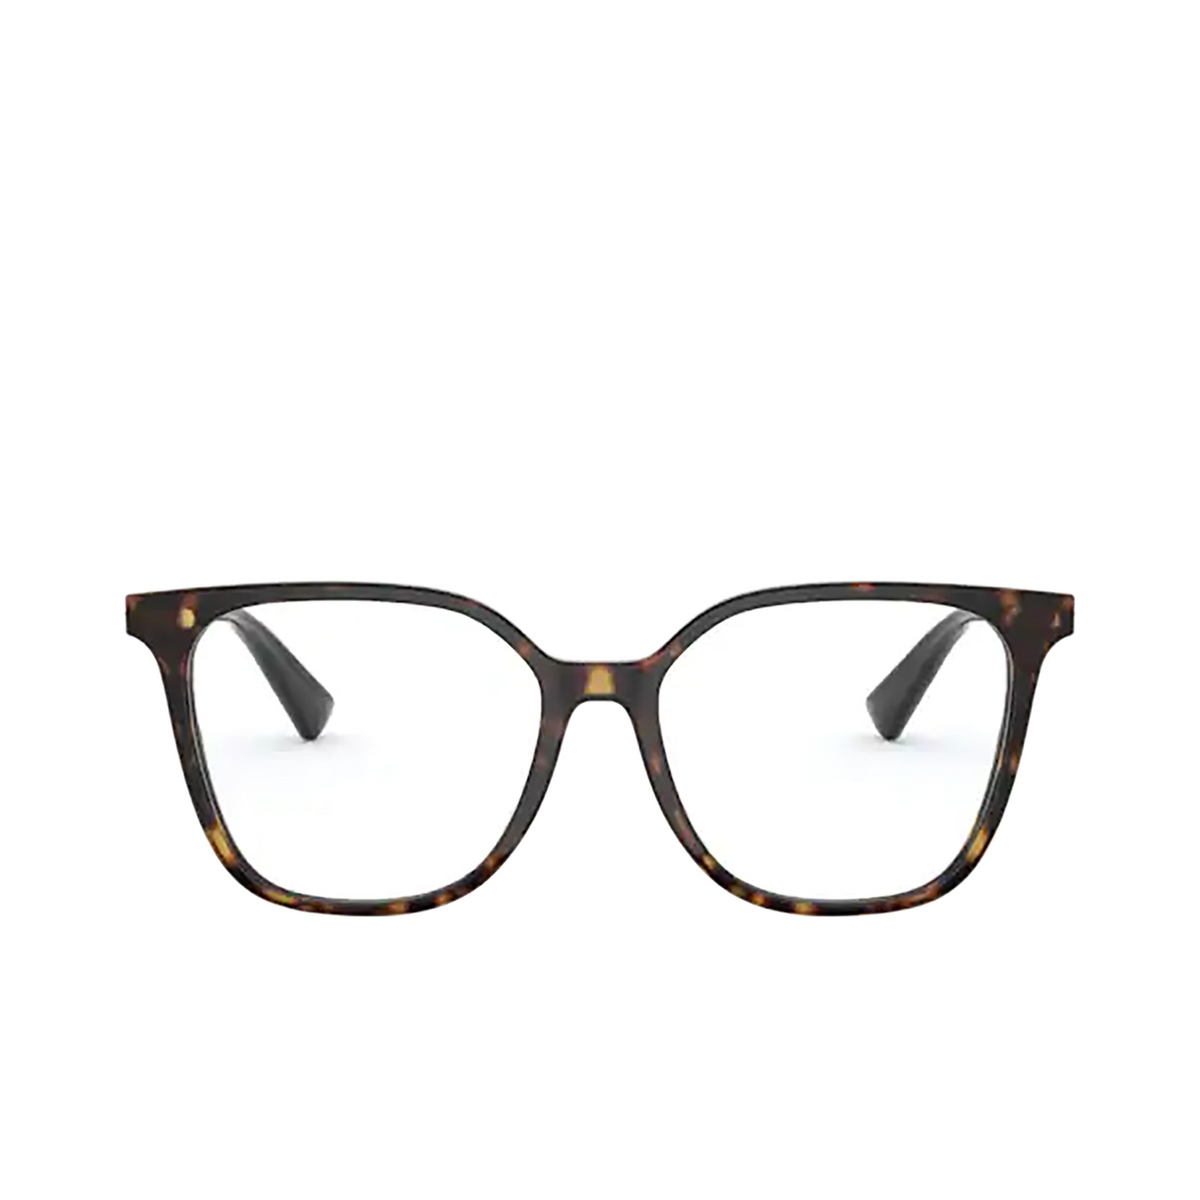 Valentino® Square Eyeglasses: VA3055 color Havana 5002 - front view.